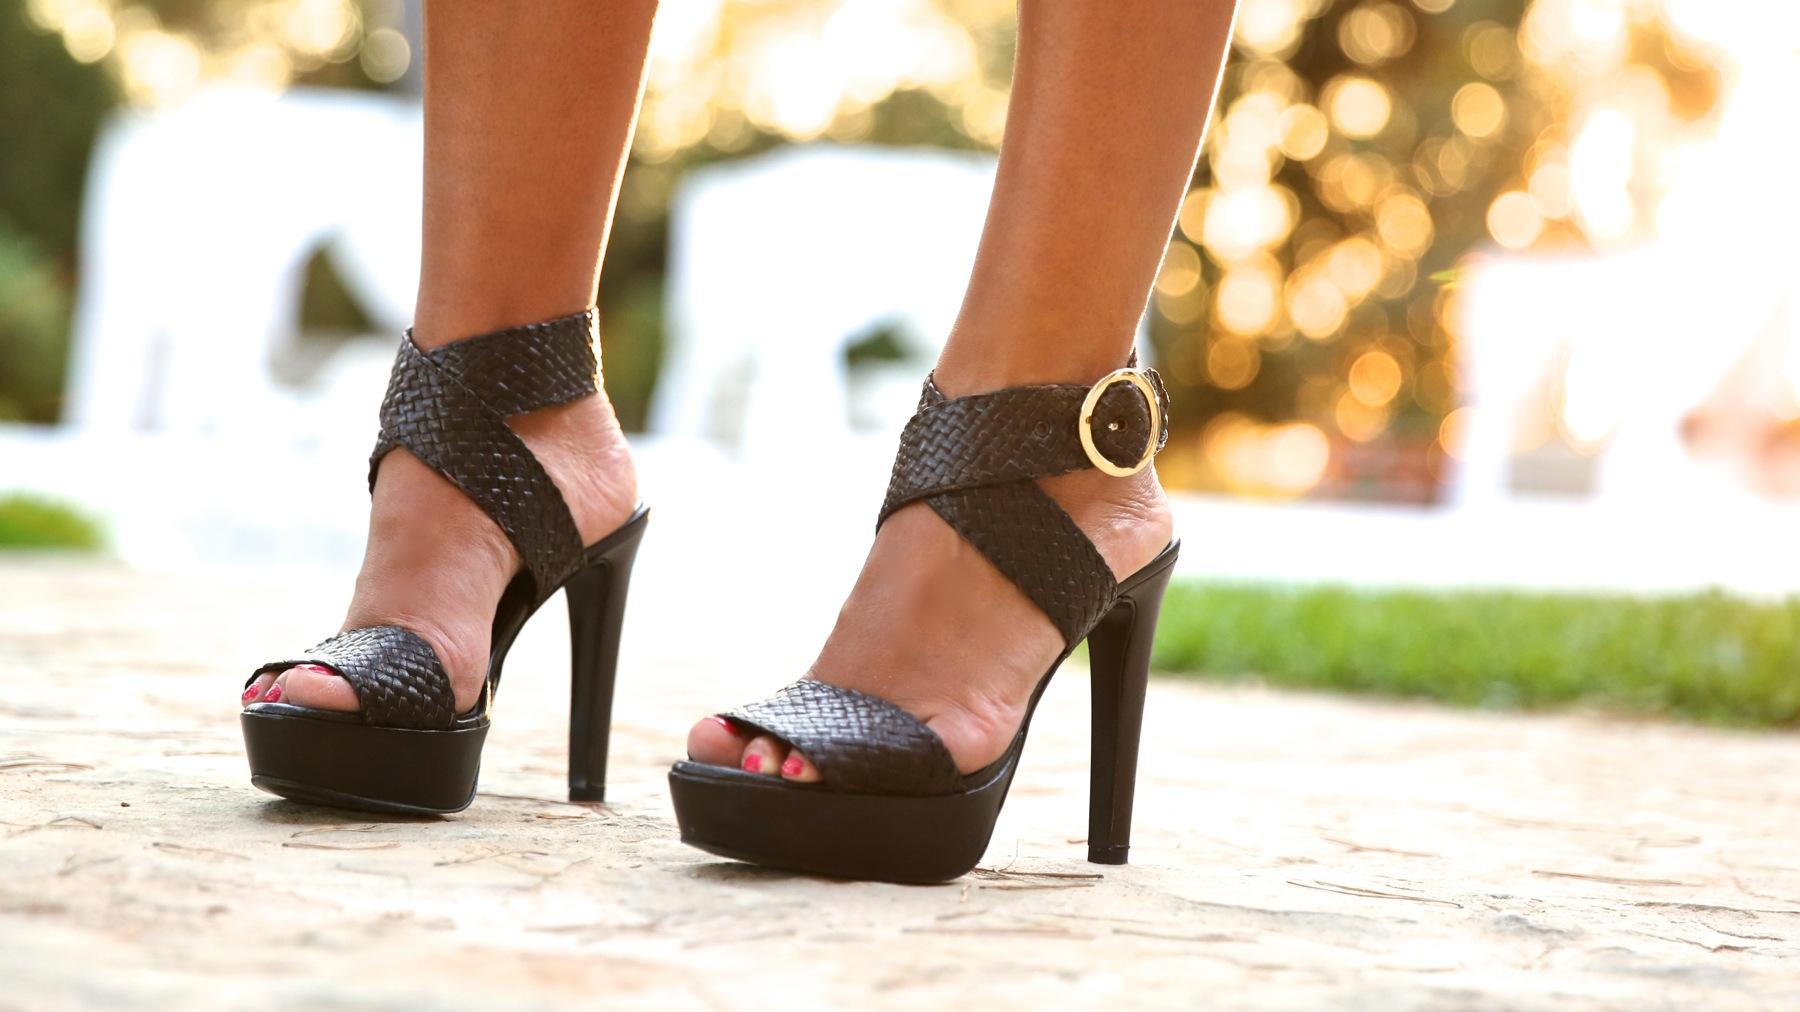 trendy_taste-look-outfit-street_style-ootd-blog-blogger-fashion_spain-moda_españa-boho-hippie-denim_shorts-shorts_vaqueros-blusa-blouse-mas34-pg-ibiza-sa_talaia-3